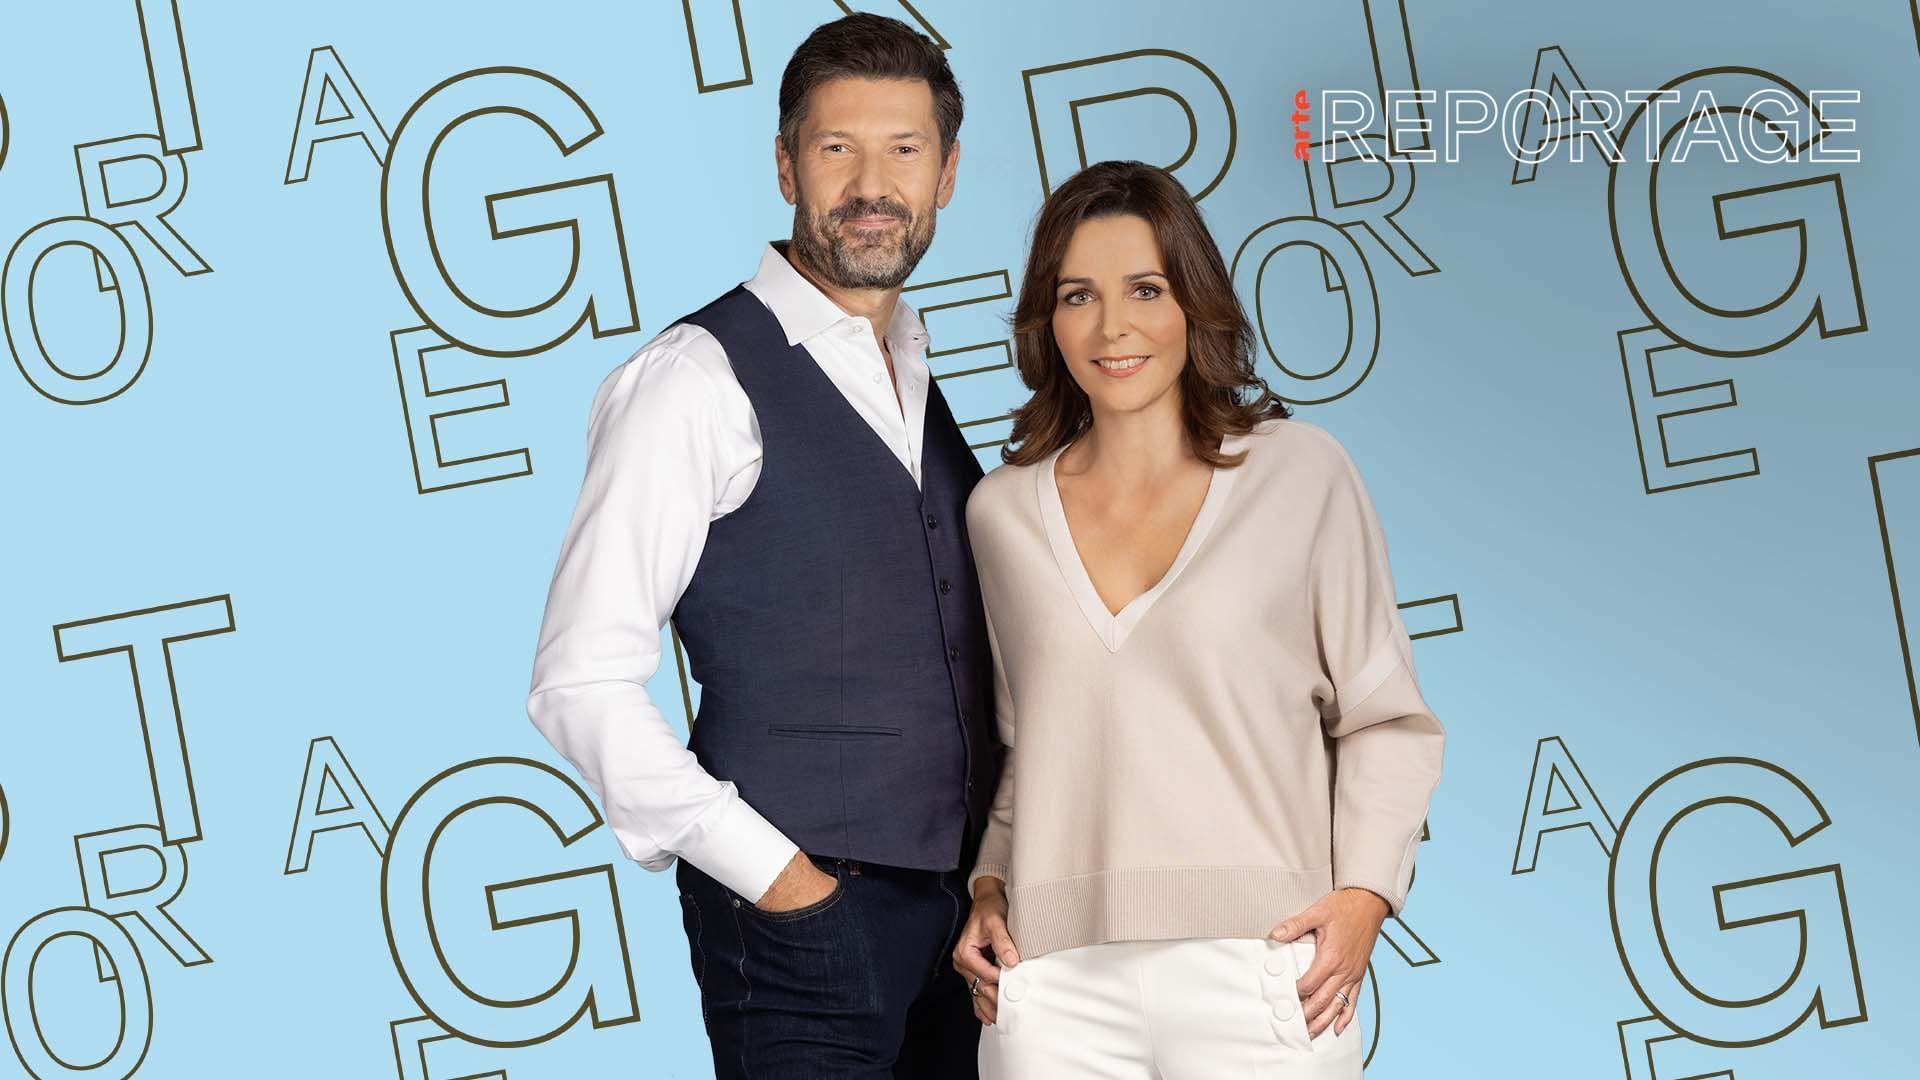 ARTE Reportage - najlepsze reportaże